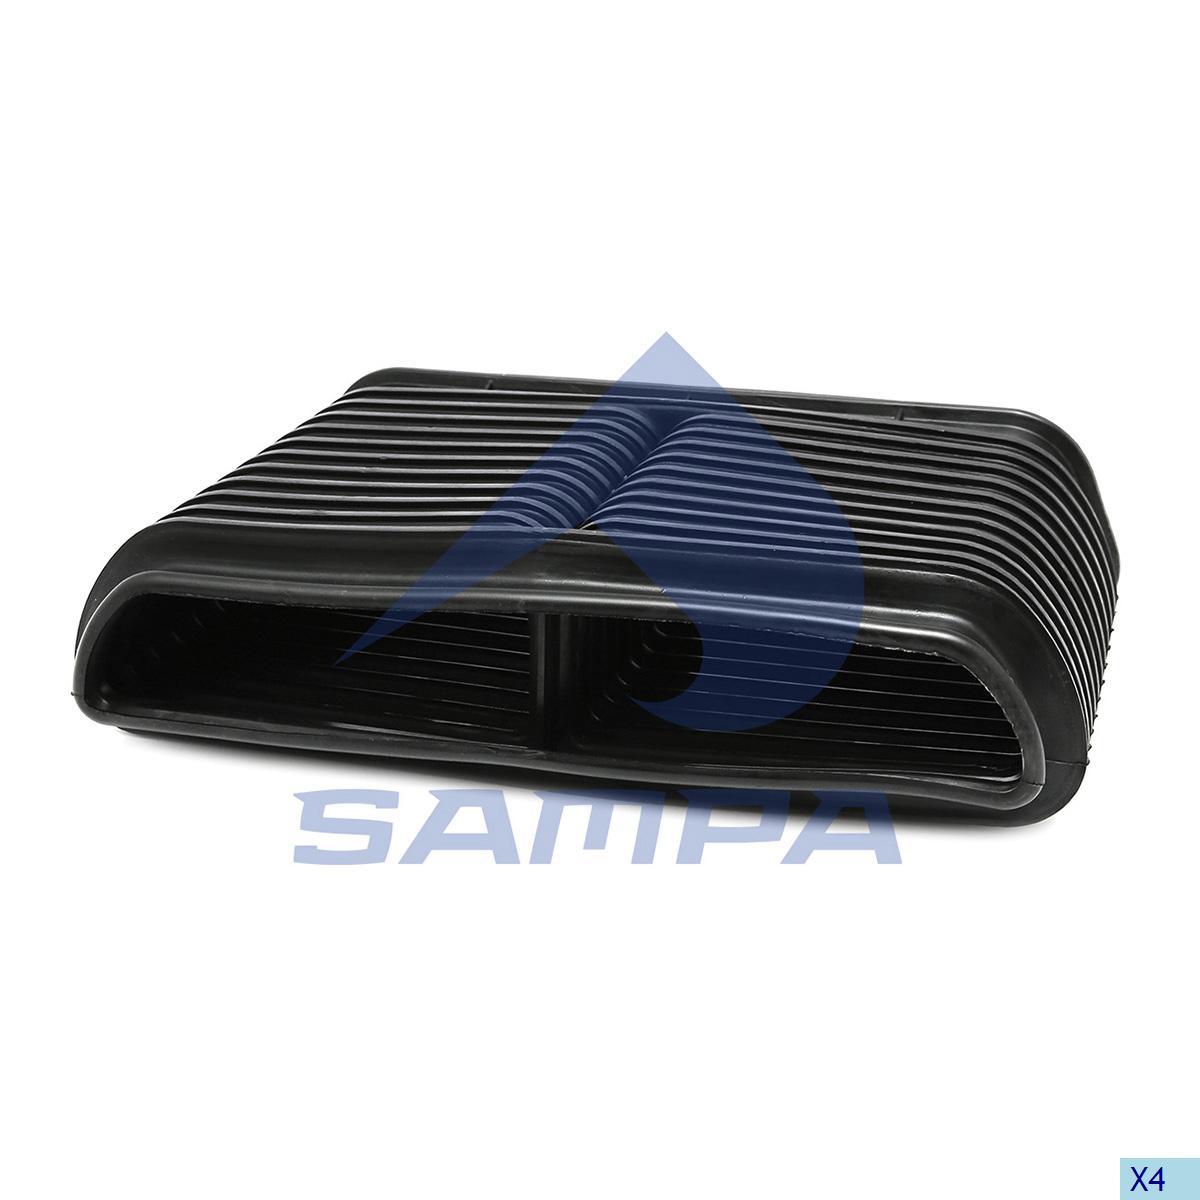 Bellow, Air Filter, R.V.I., Engine